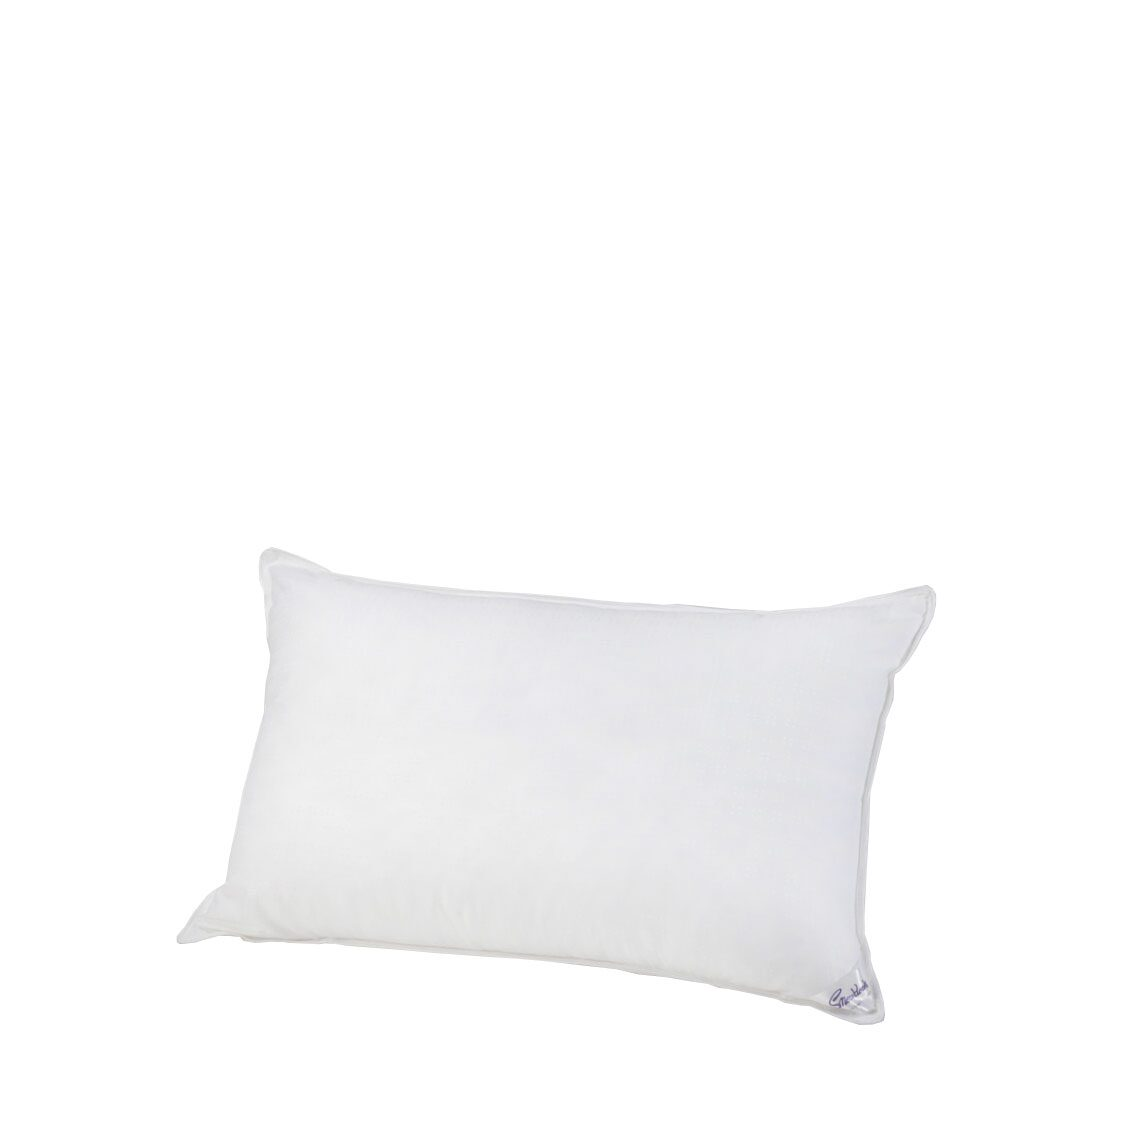 Soft Microfibre Pillow